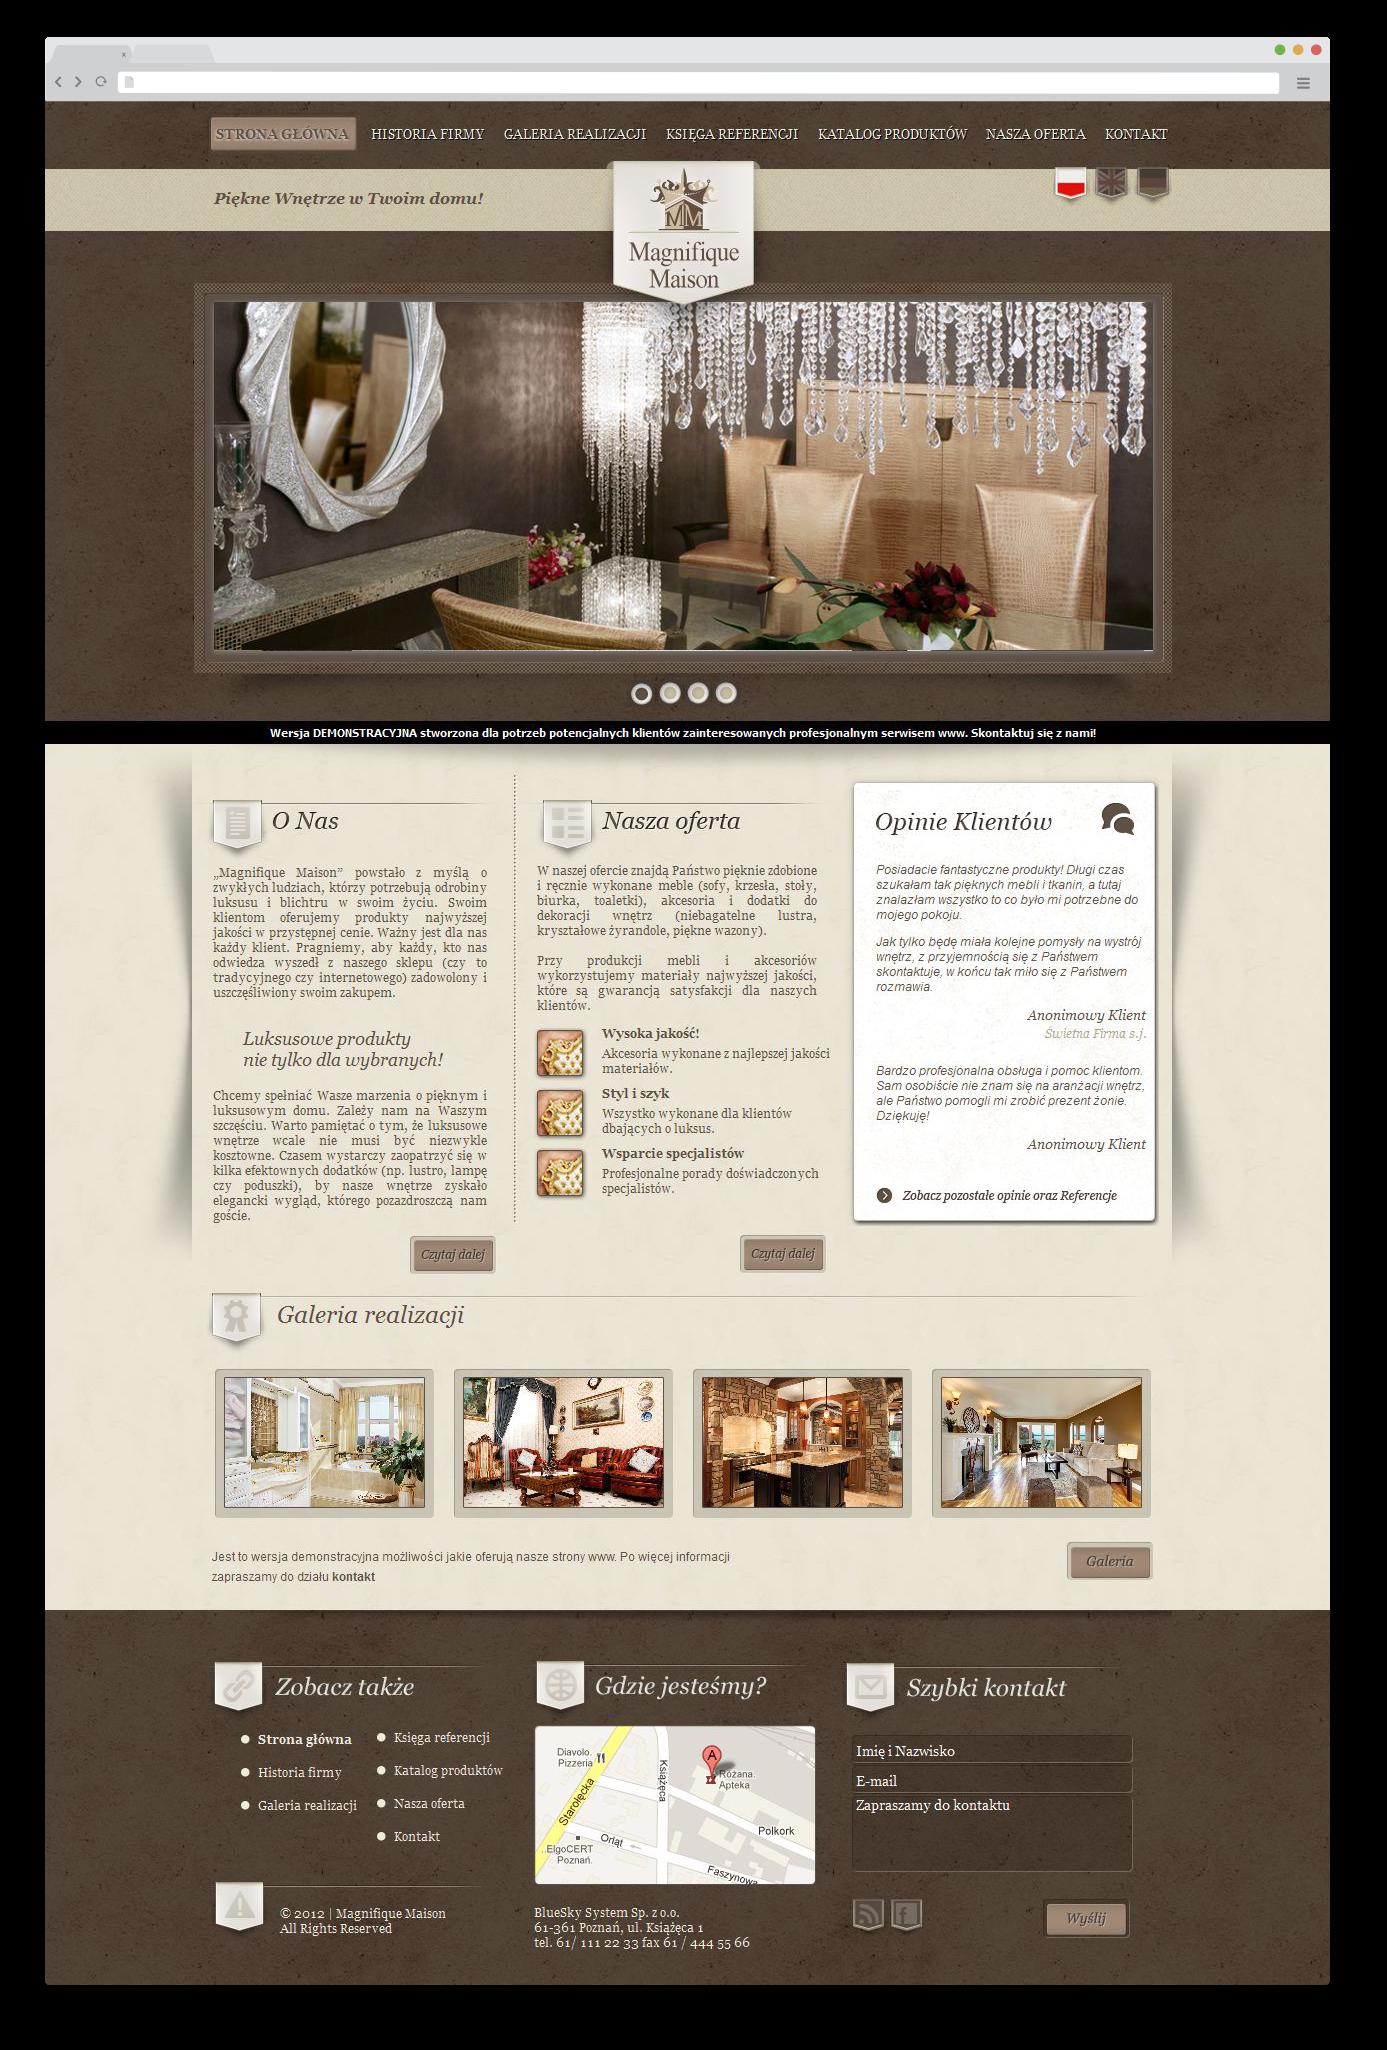 Portfolio BlueSky System: Magnifique Maison - FULL